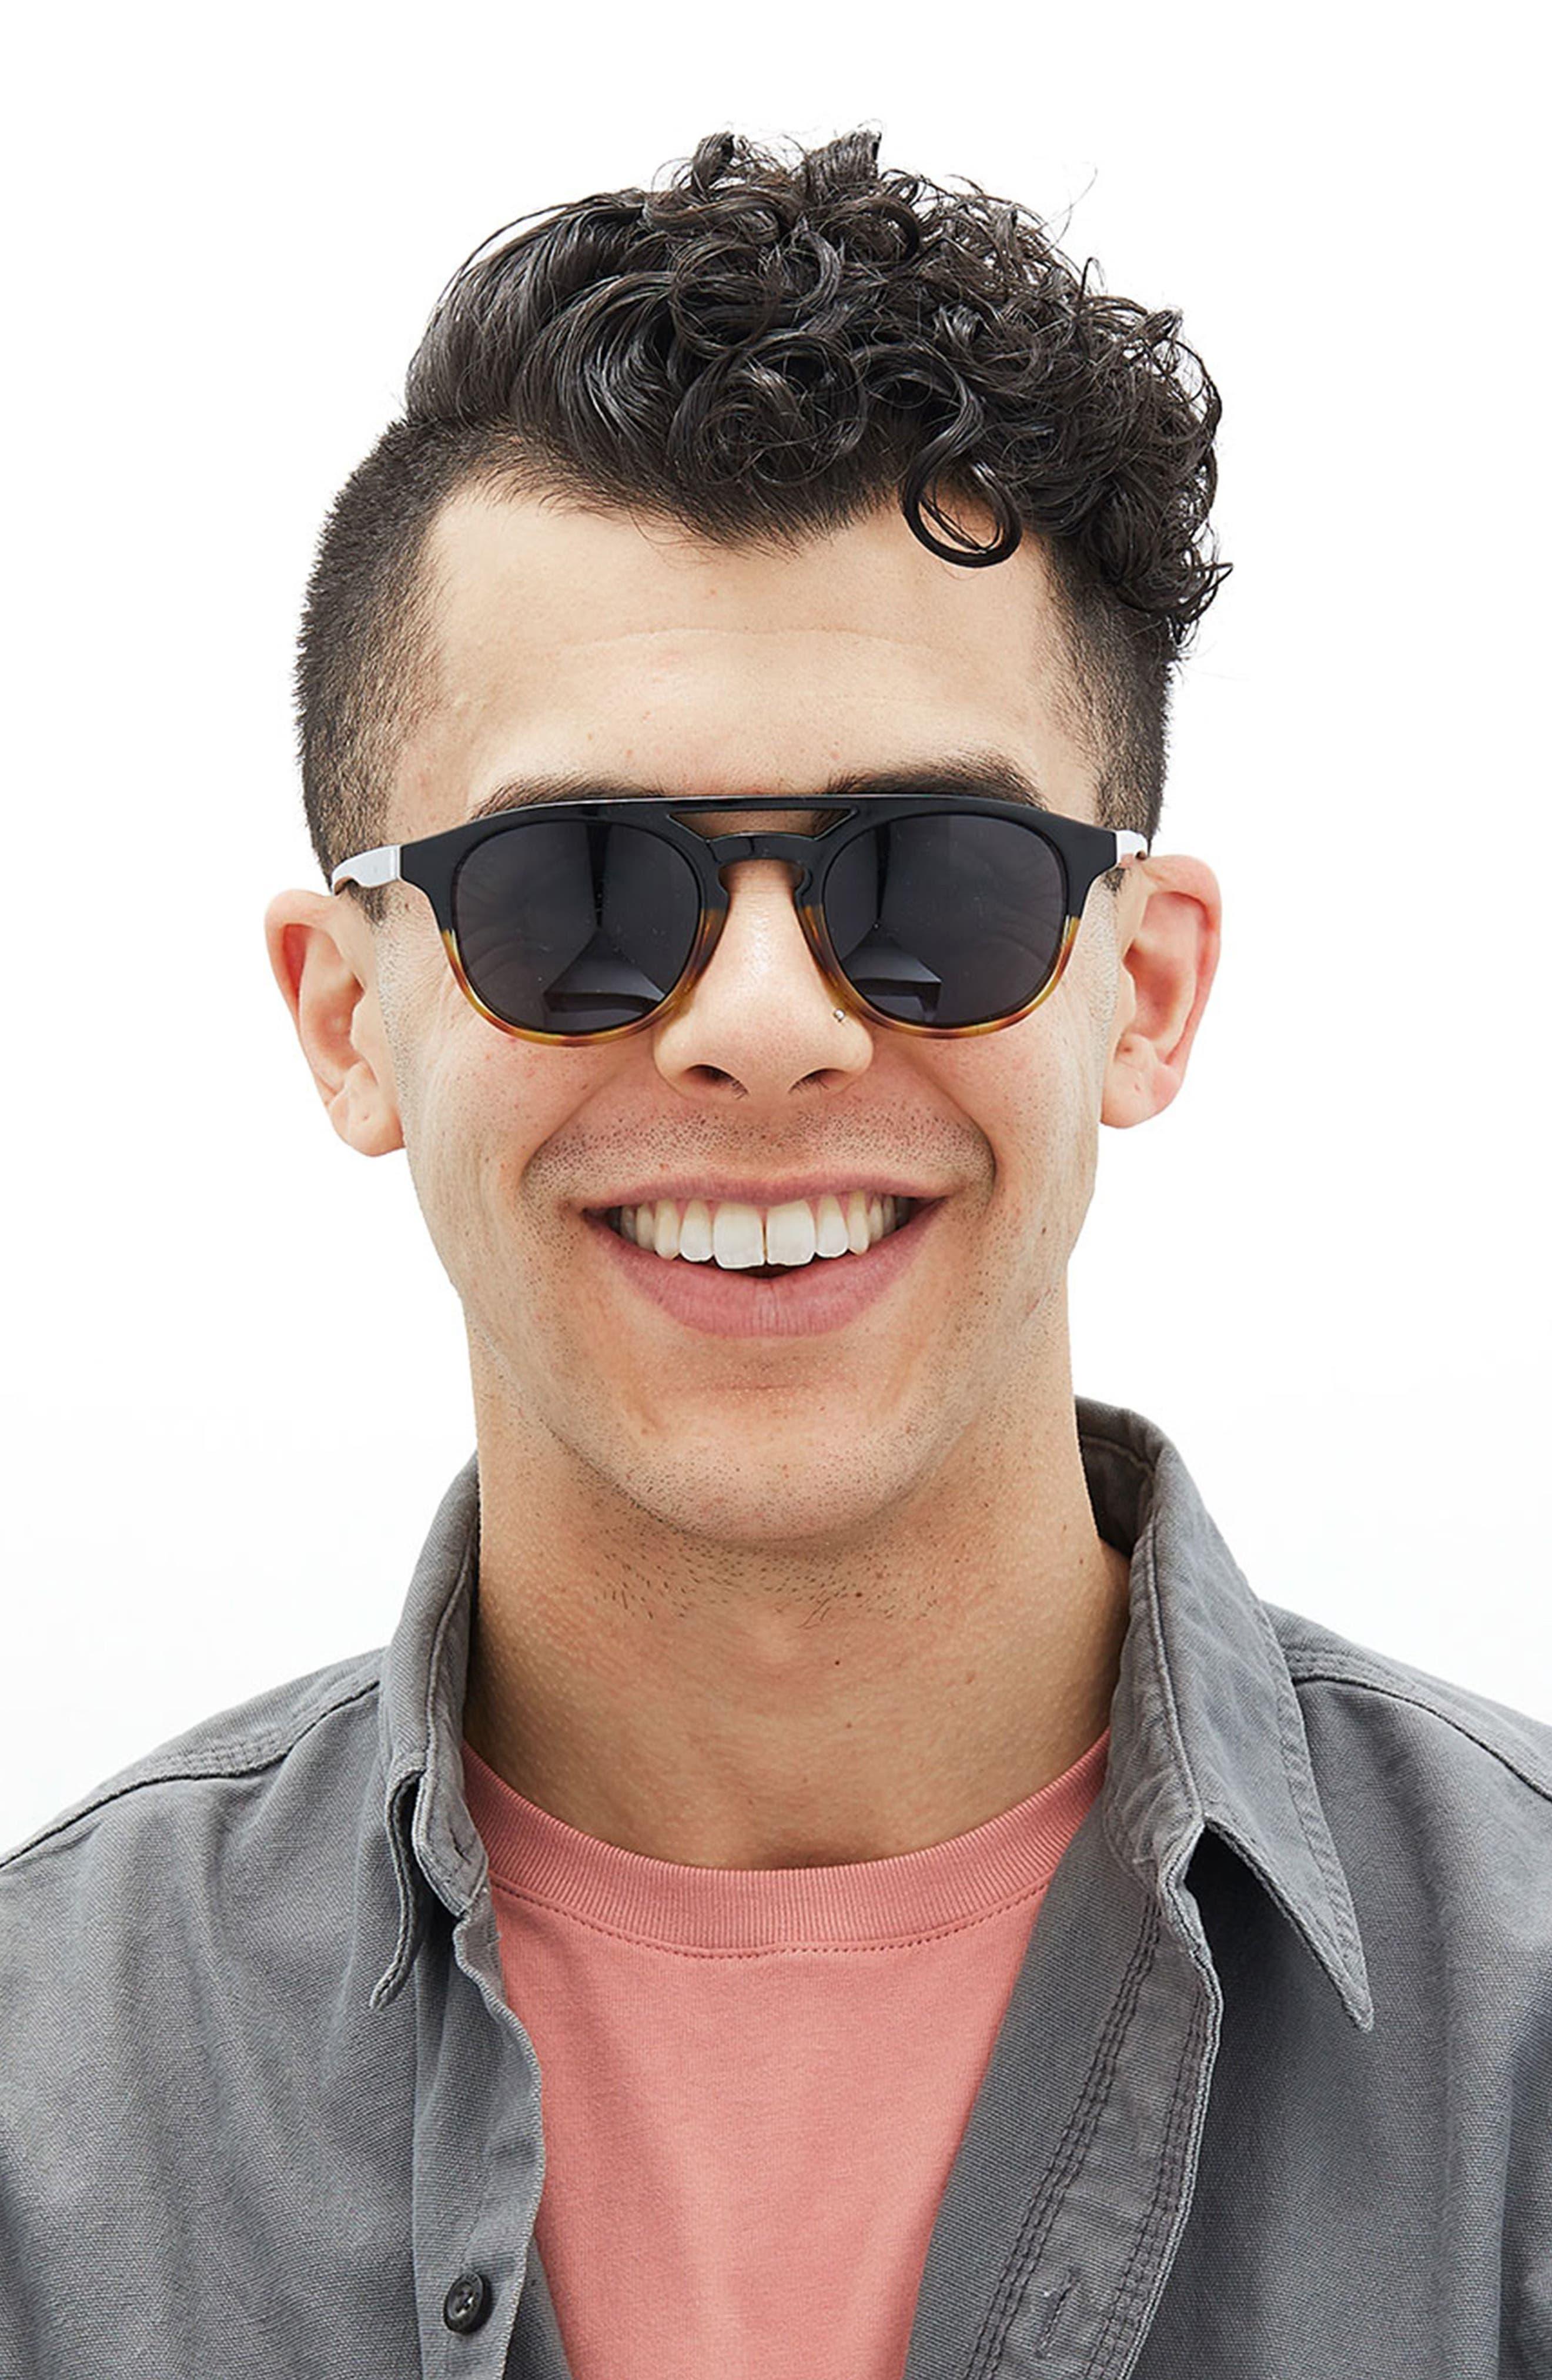 Olema 53mm Polarized Sunglasses,                             Alternate thumbnail 4, color,                             TORTOISE AMBER